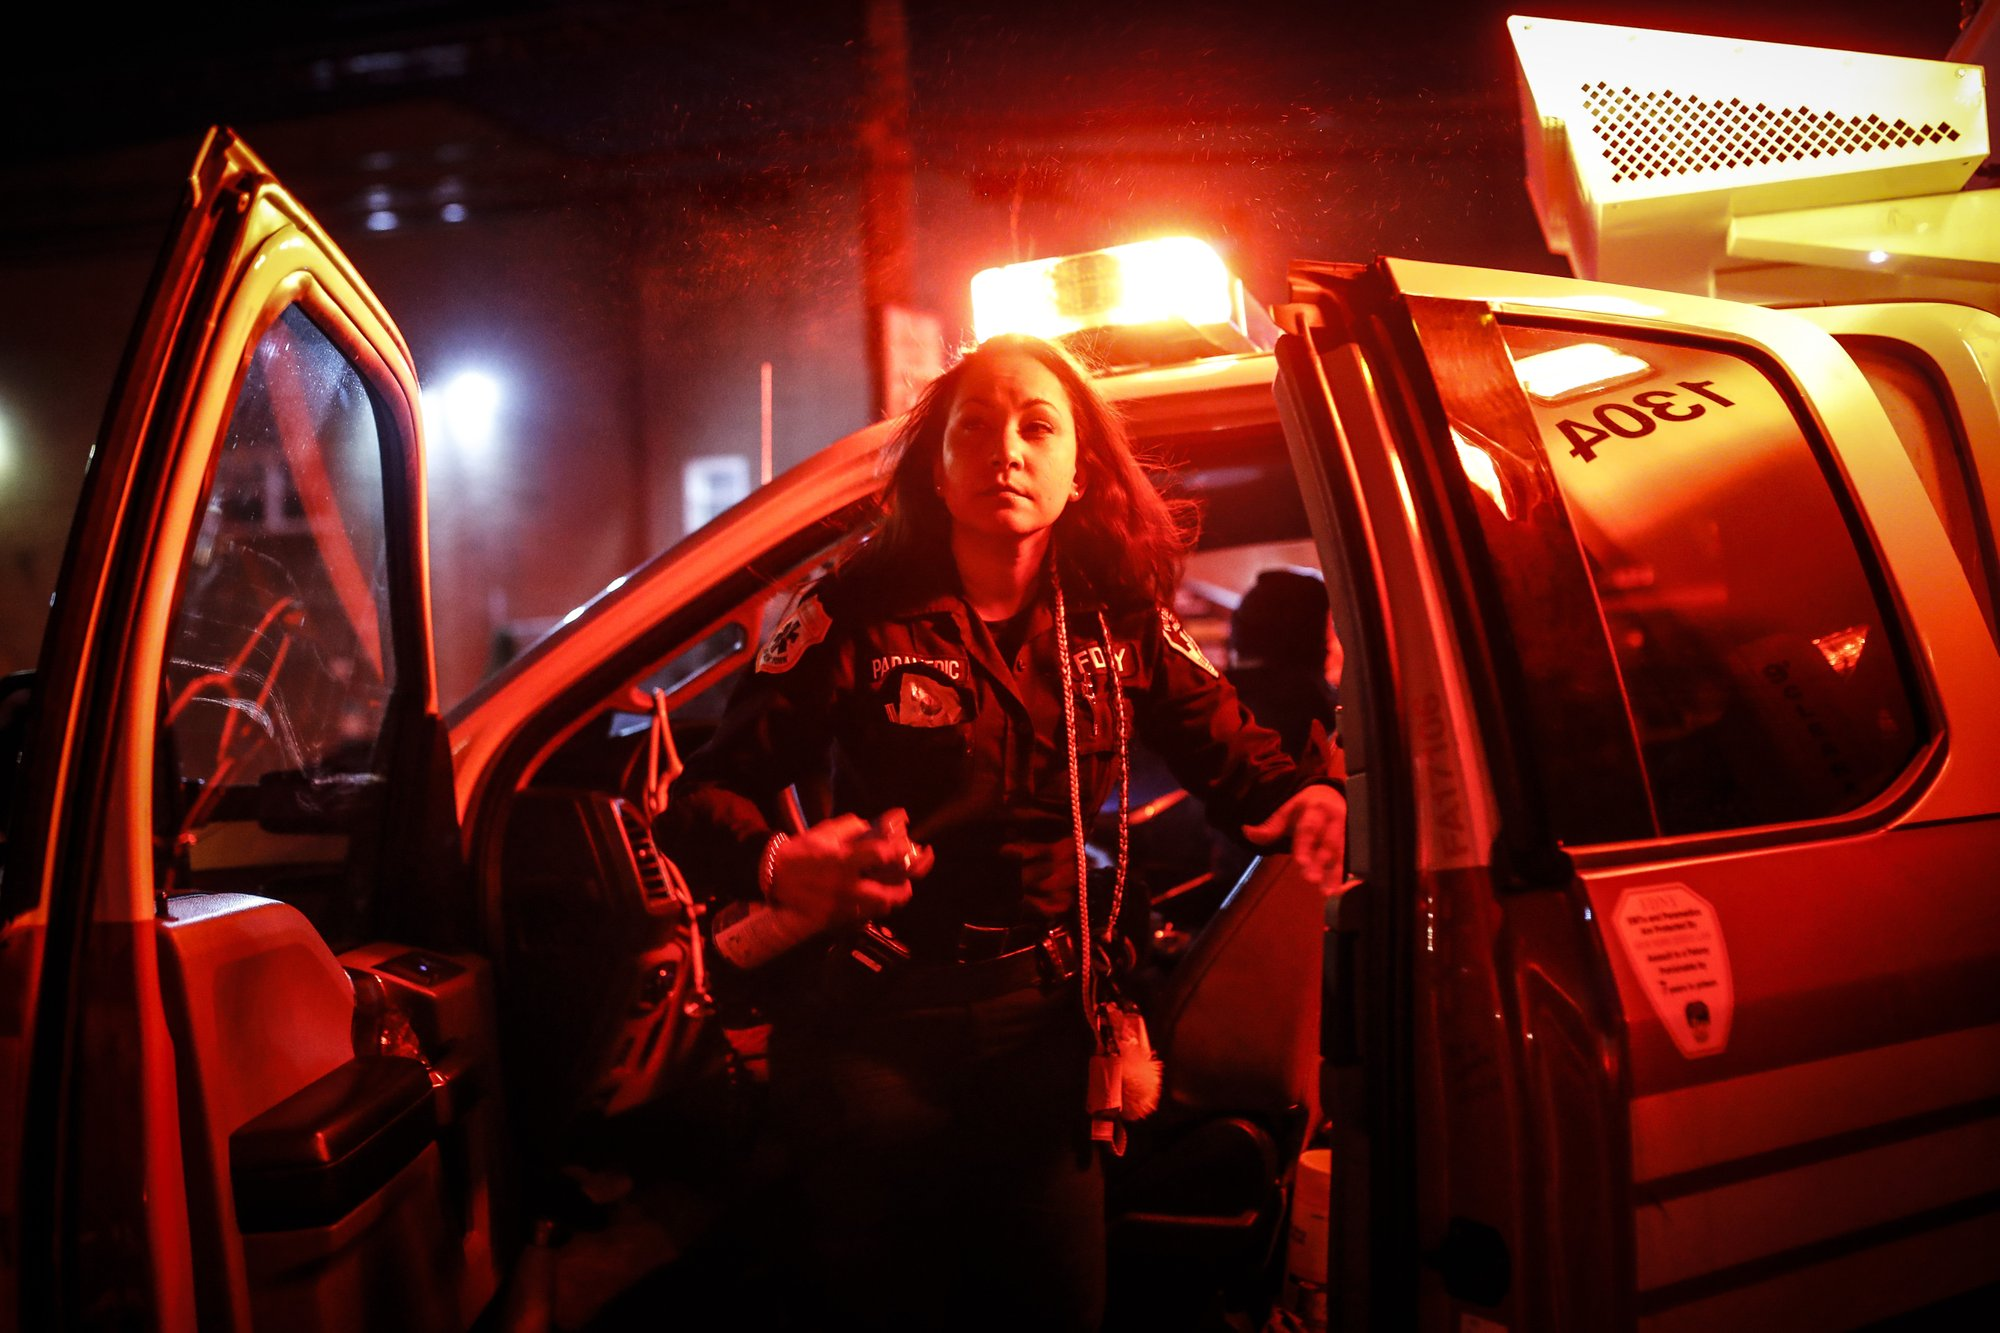 'You hear the cries': Virus toll haunts a New York paramedic